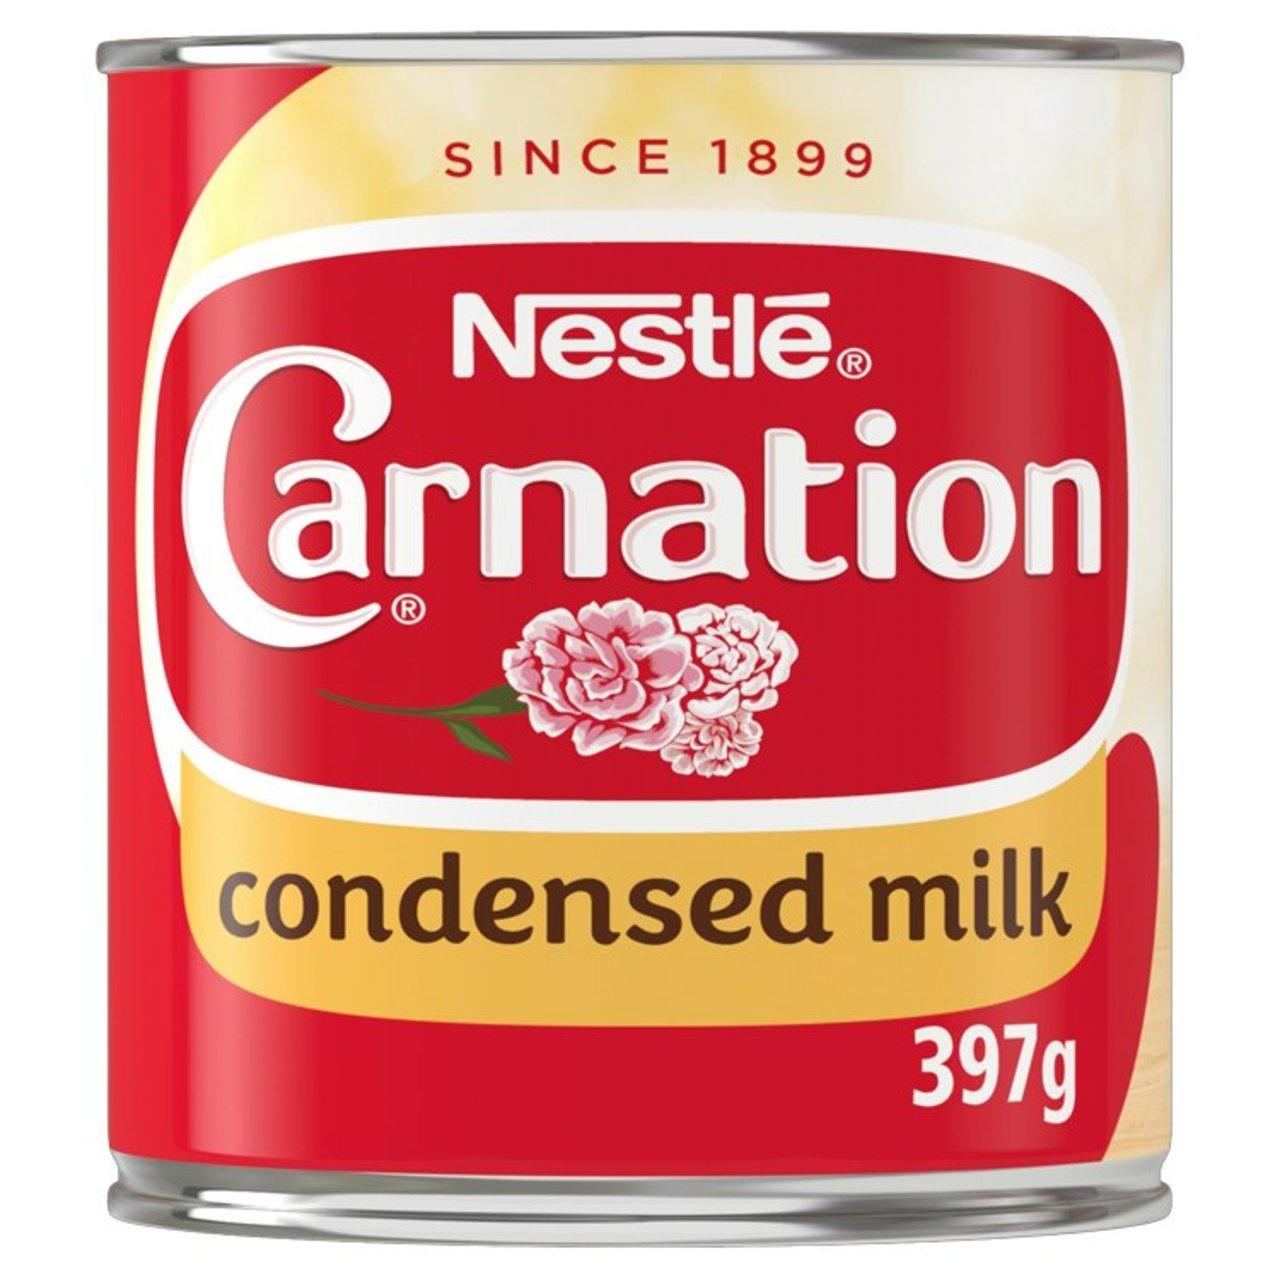 Carnation Sweetened Condensed Milk Tin 397g - £1 @ Morrisons